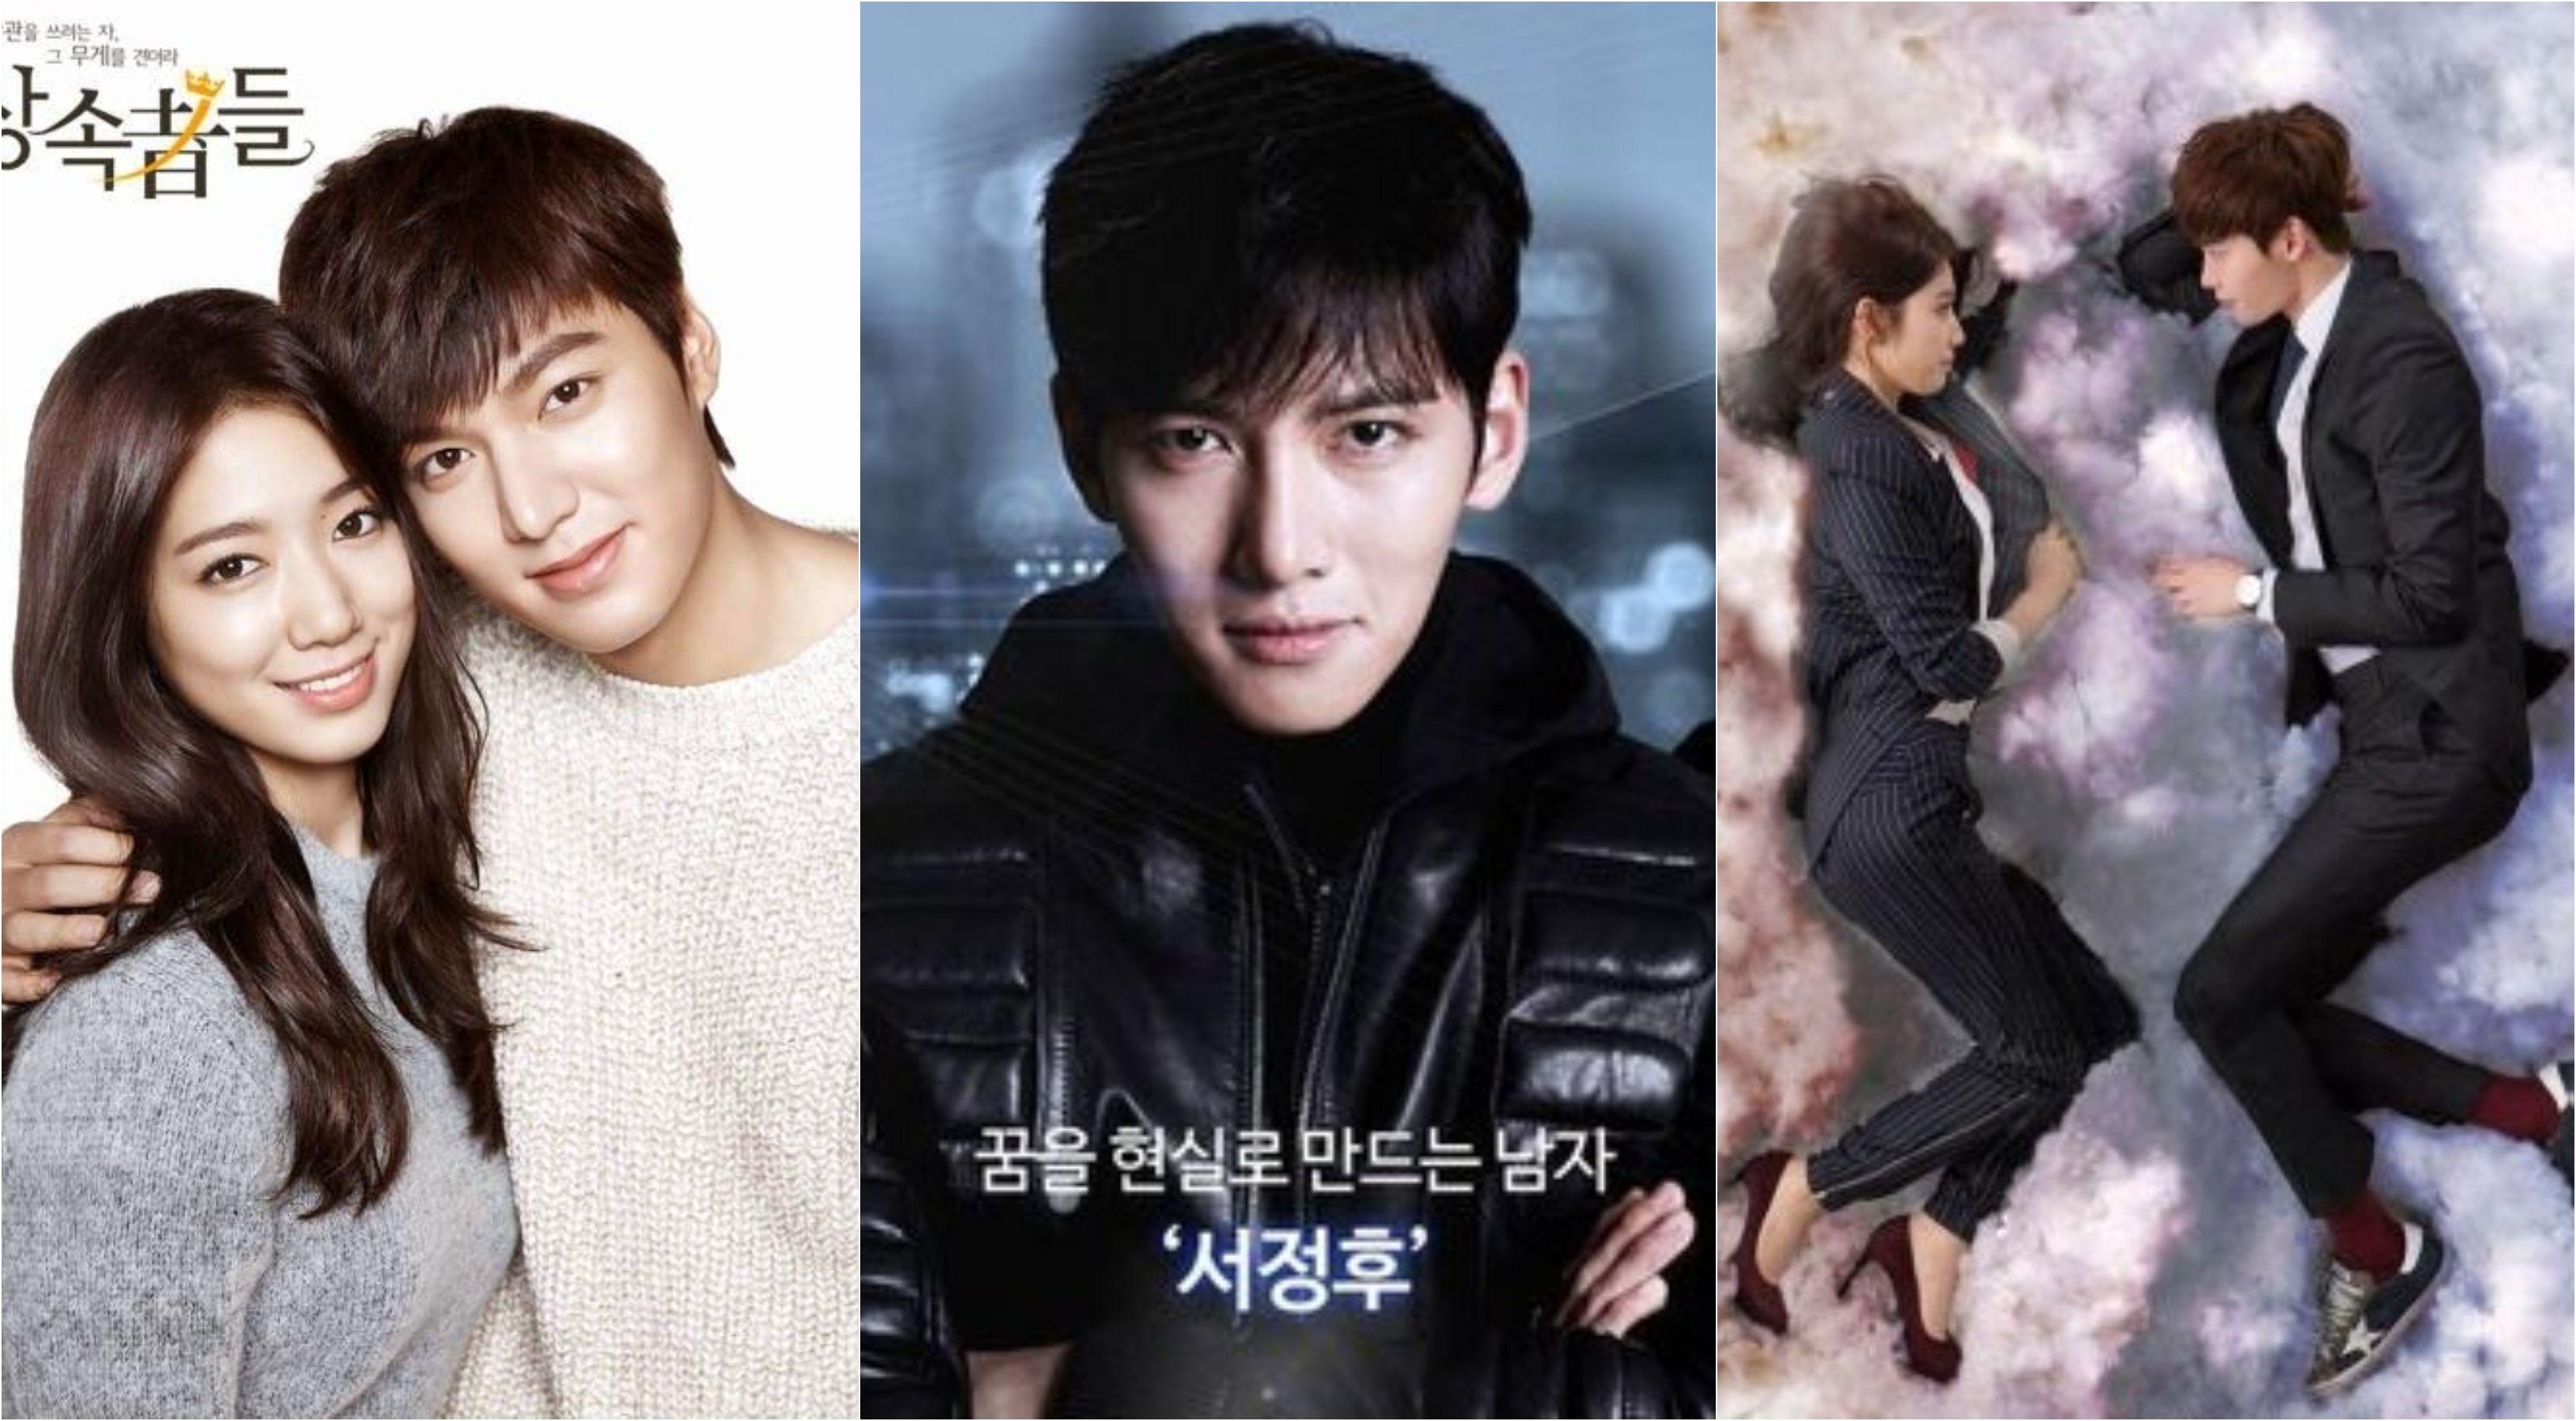 Best Korean Dramas To Watch On Youtube With English Subtitles Alphagirl Reviews Korean Drama Korean Drama Romance Korean Drama Tv